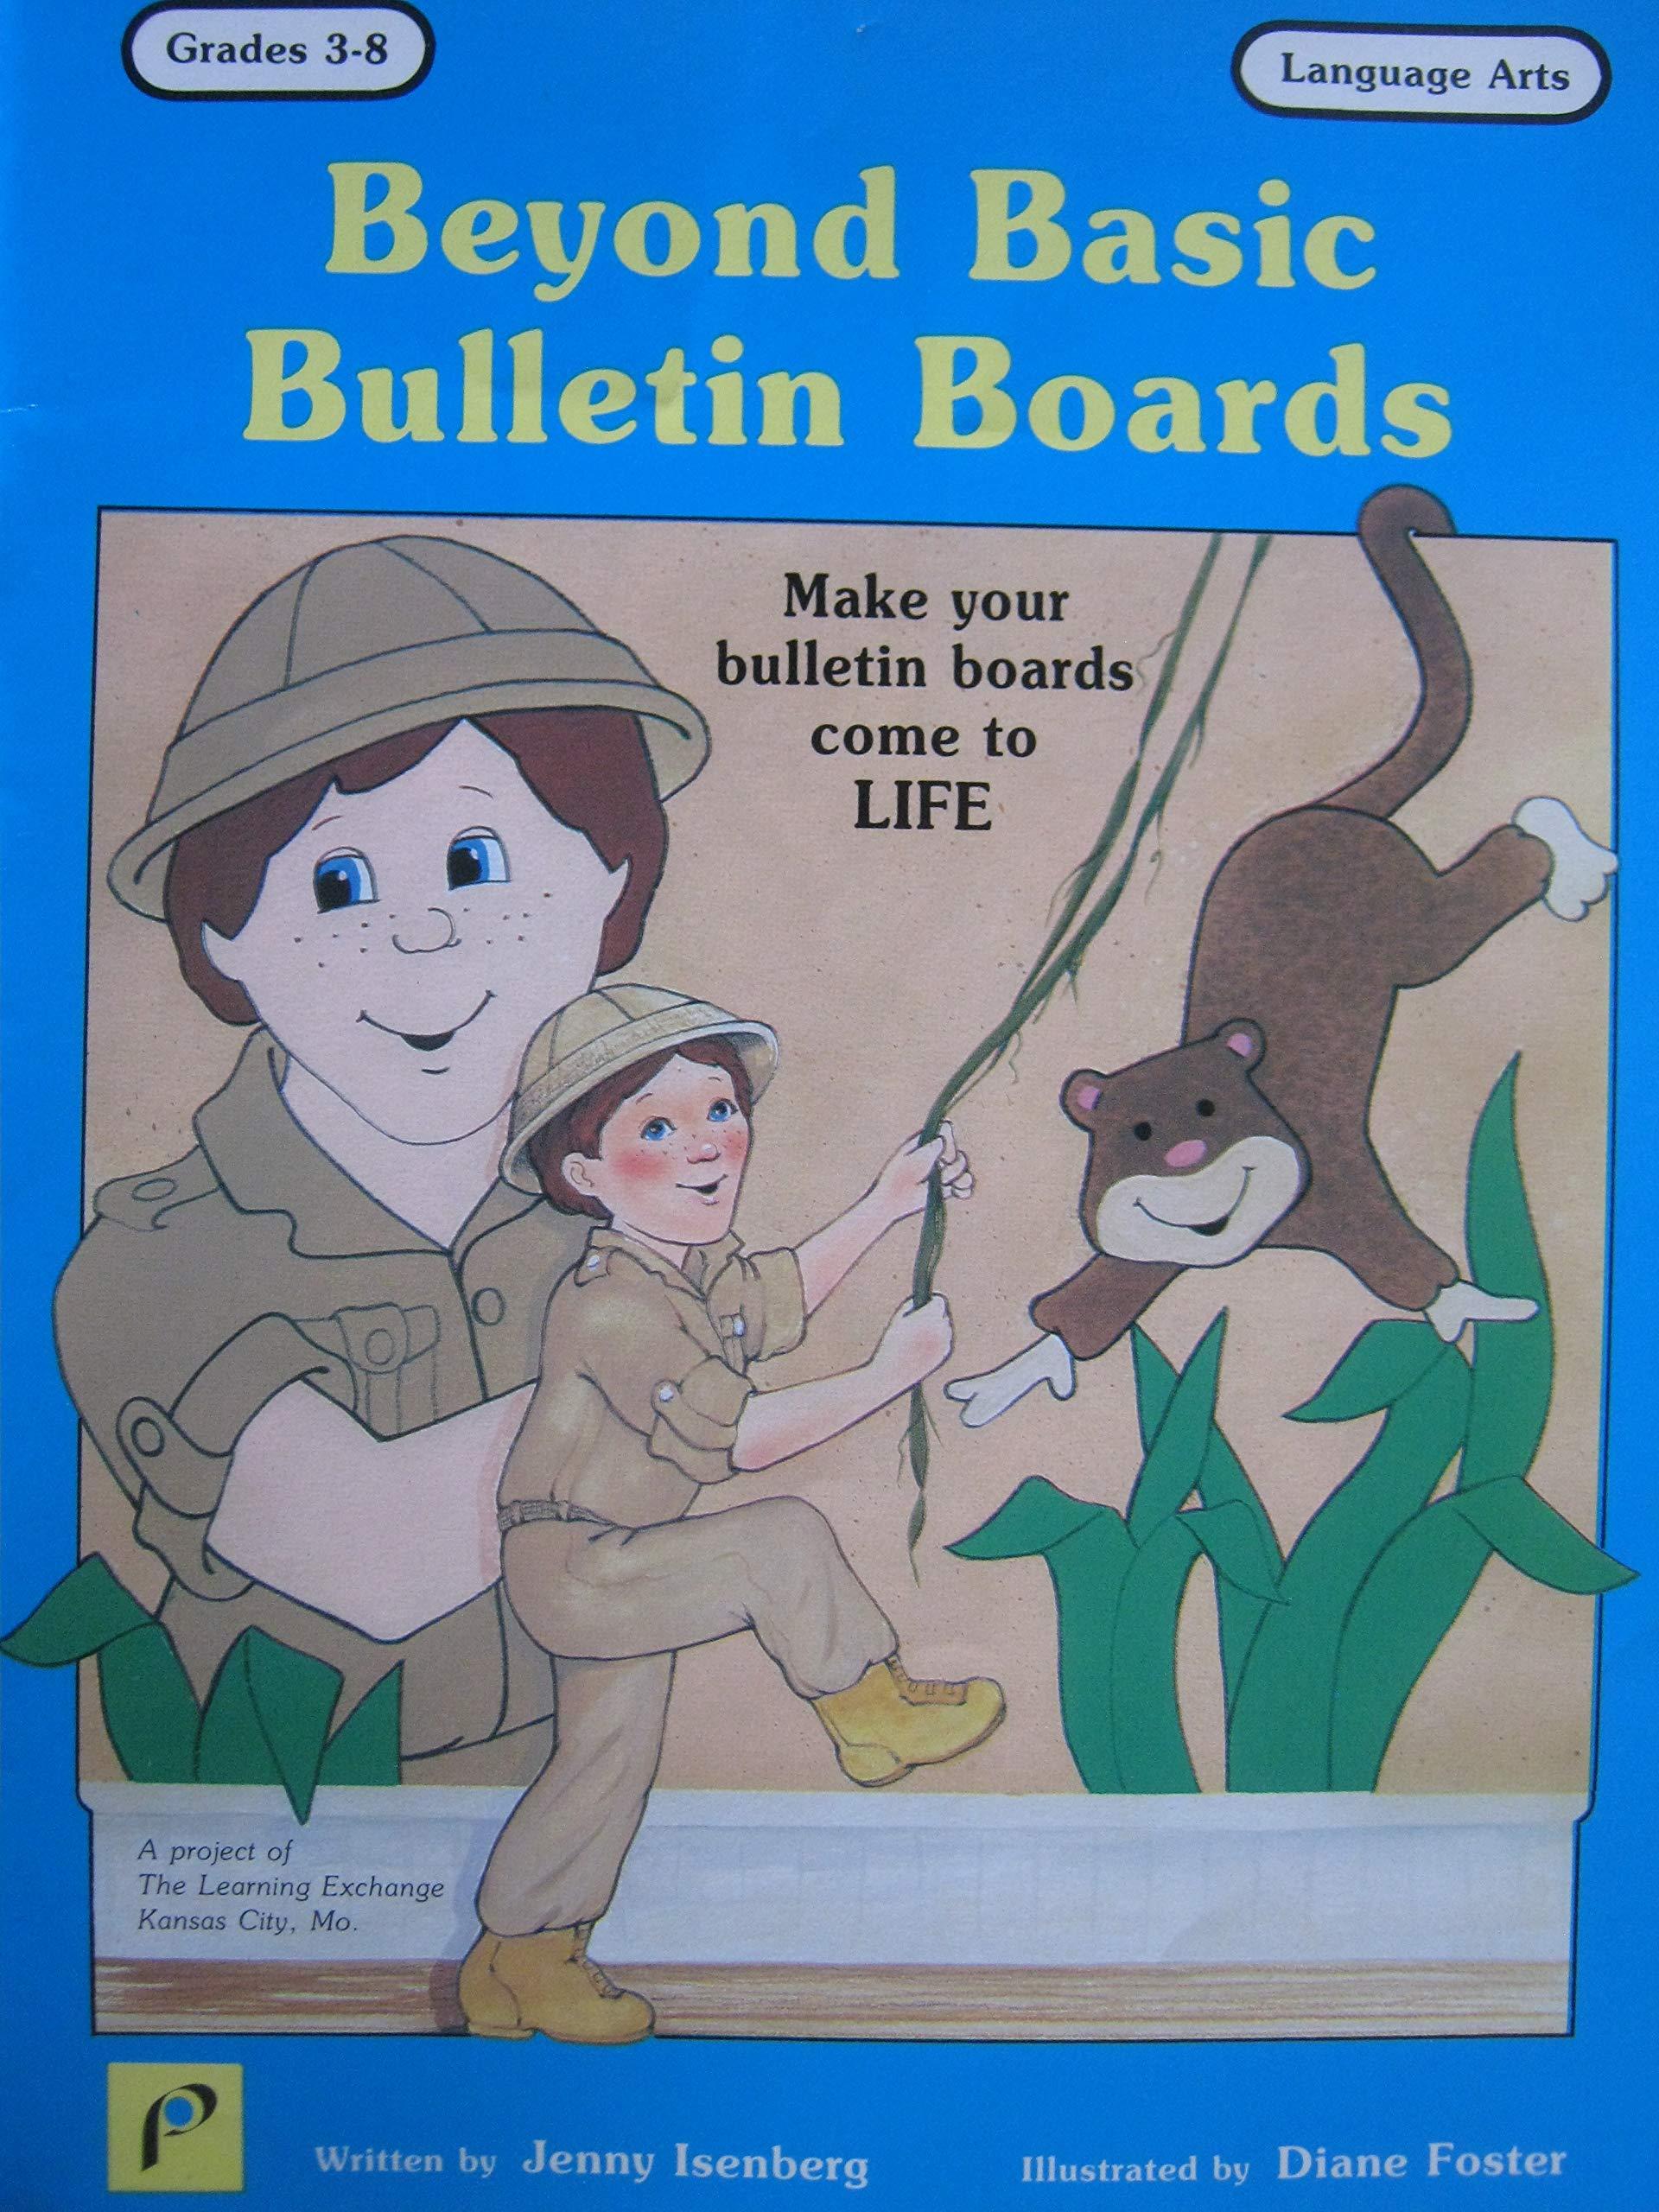 Beyond Basic Bulletin Boards Grades 3 8 Jenny Isenberg Diane Foster 9780895981103 Amazon Com Books